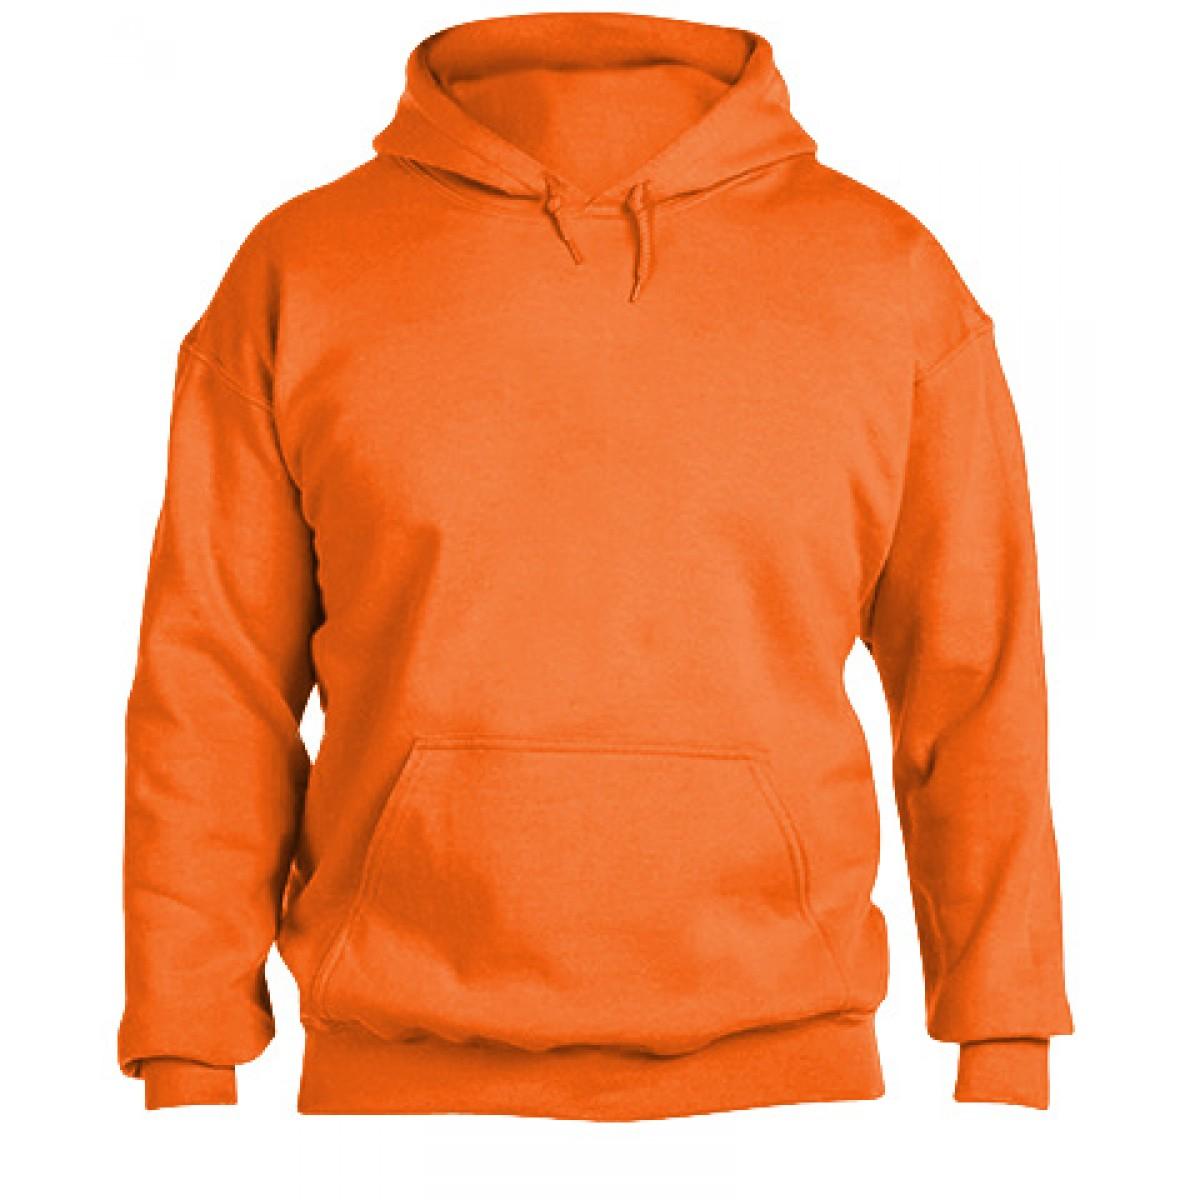 Hooded Sweatshirt 50/50 Heavy Blend Safety Orange